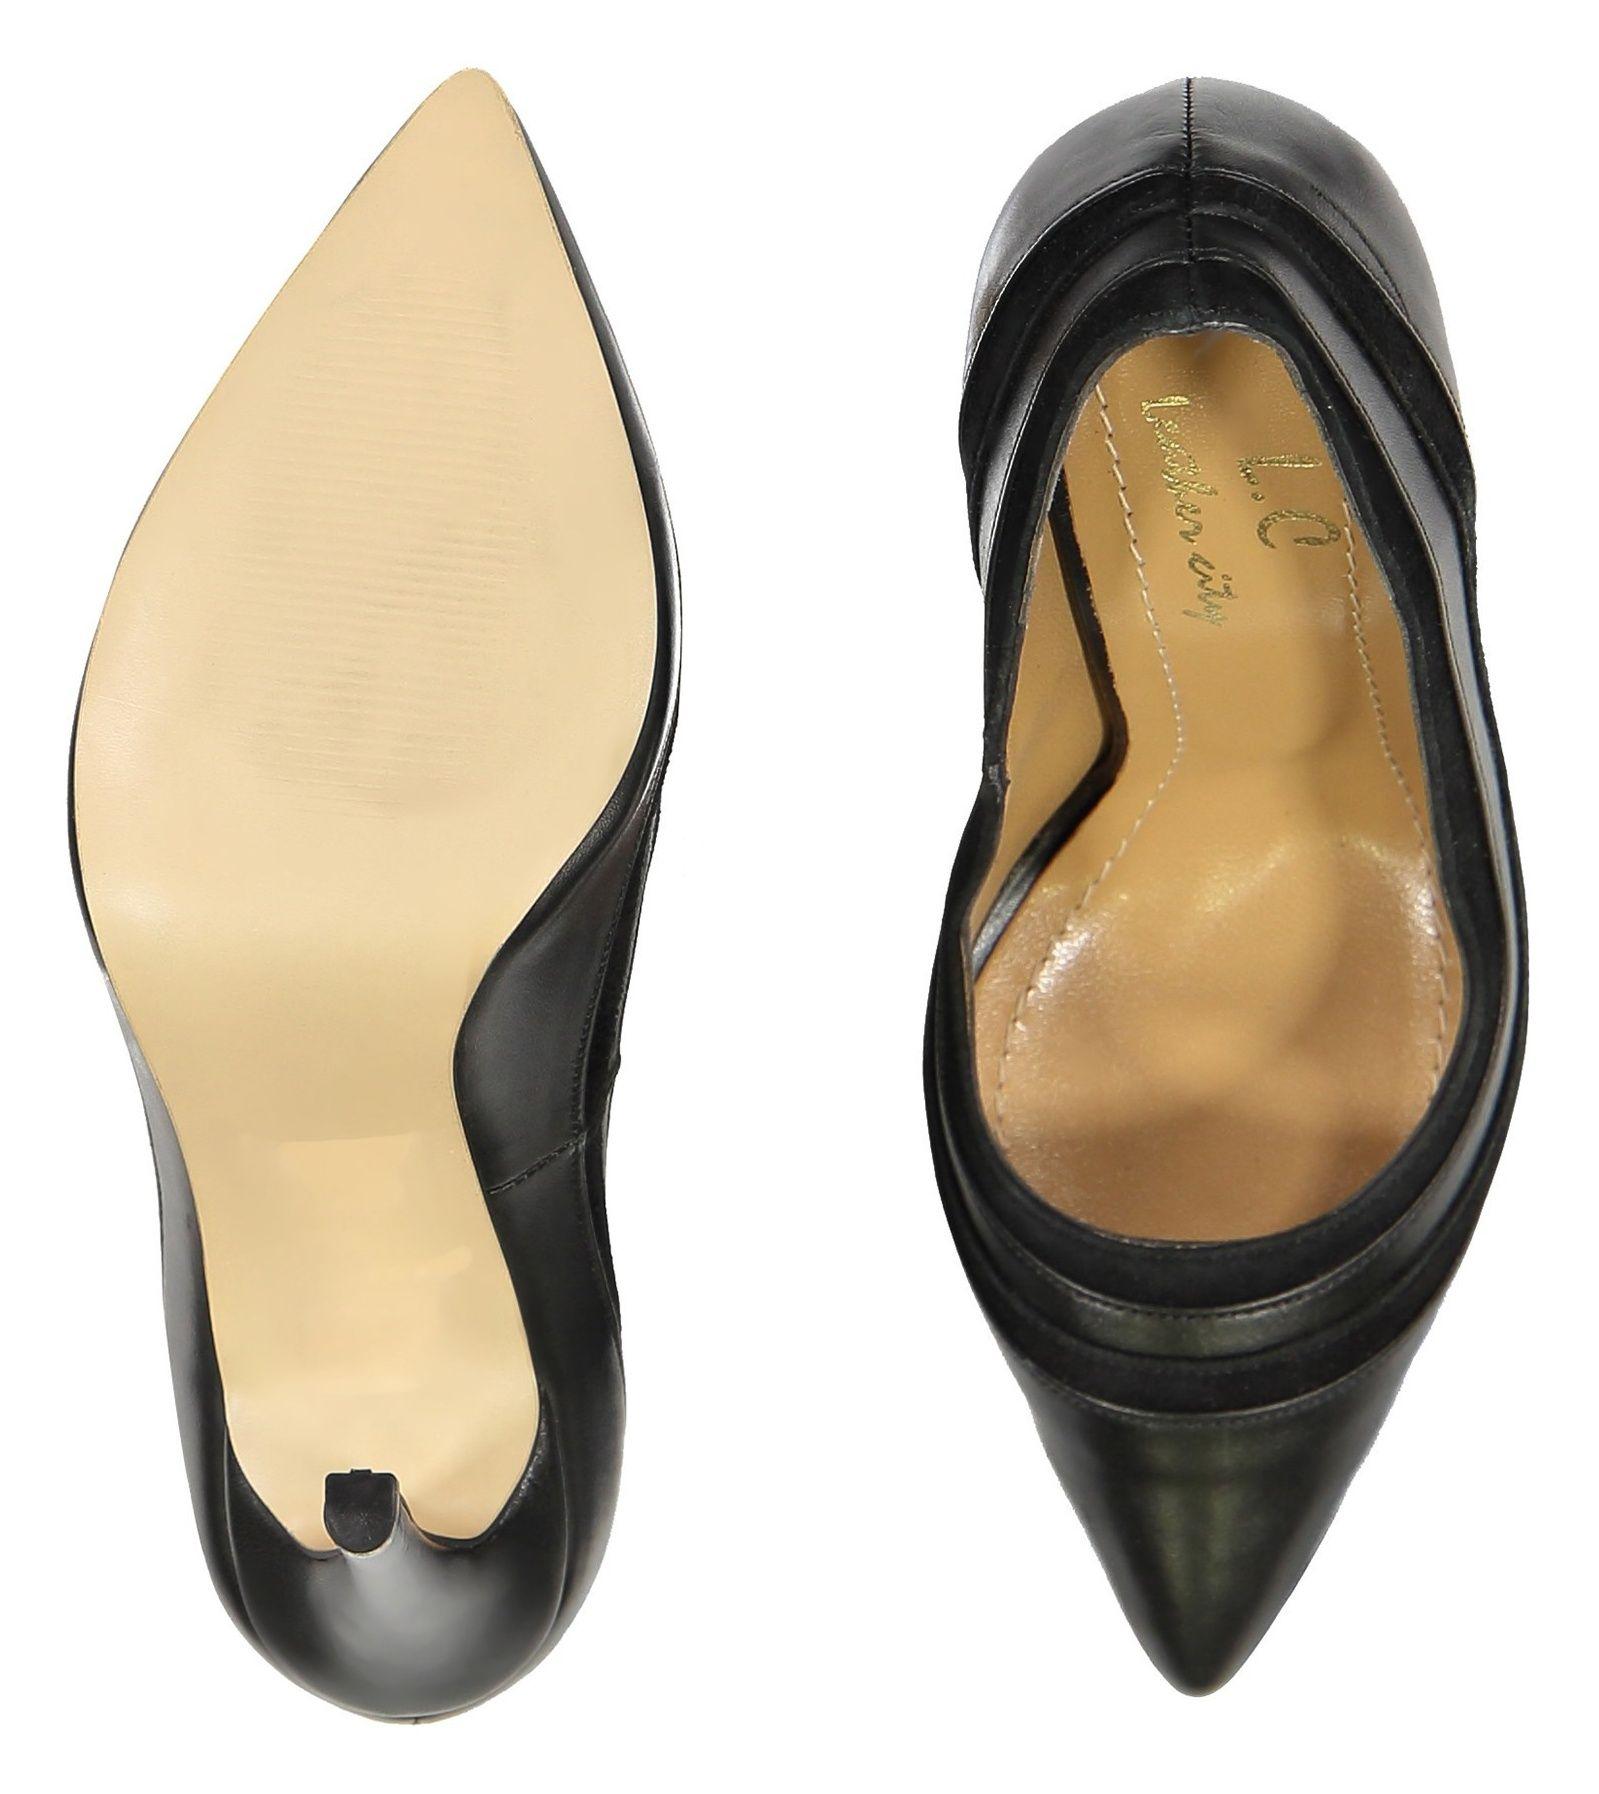 کفش پاشنه بلند چرم زنانه - شهر چرم - قهوه اي تيرهق - 2